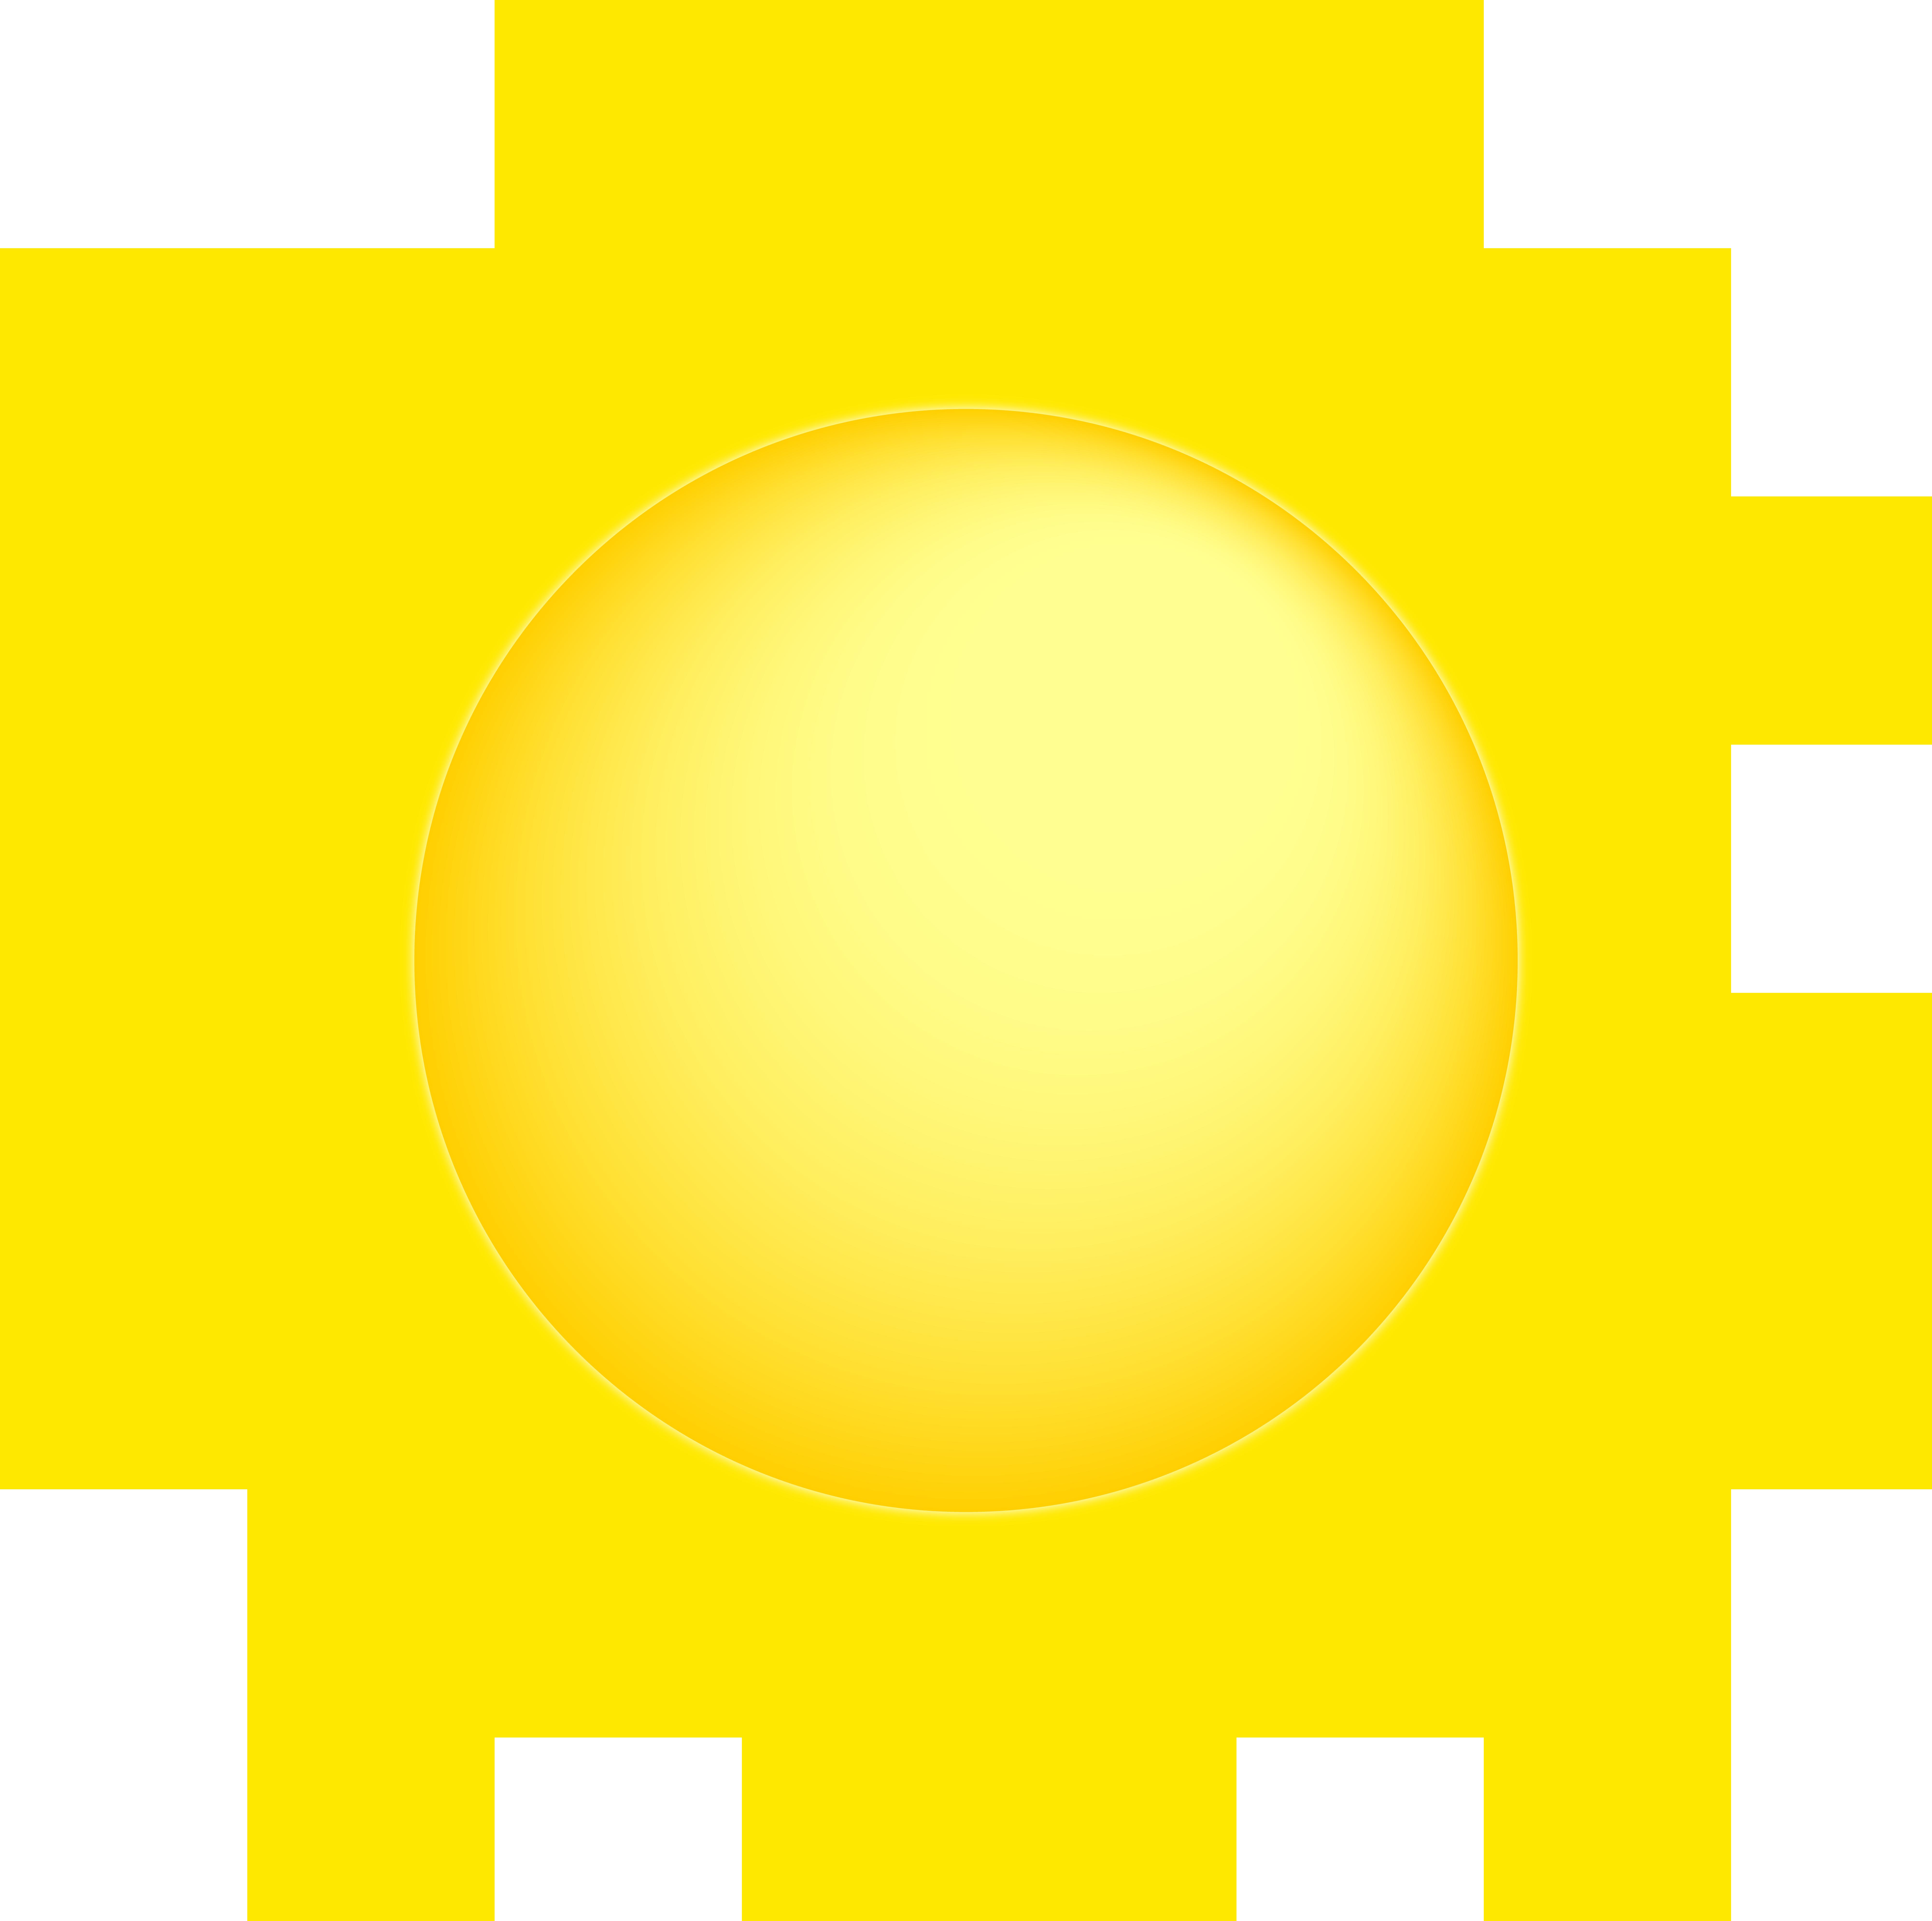 Clipart sun heart. Transparent png clip art